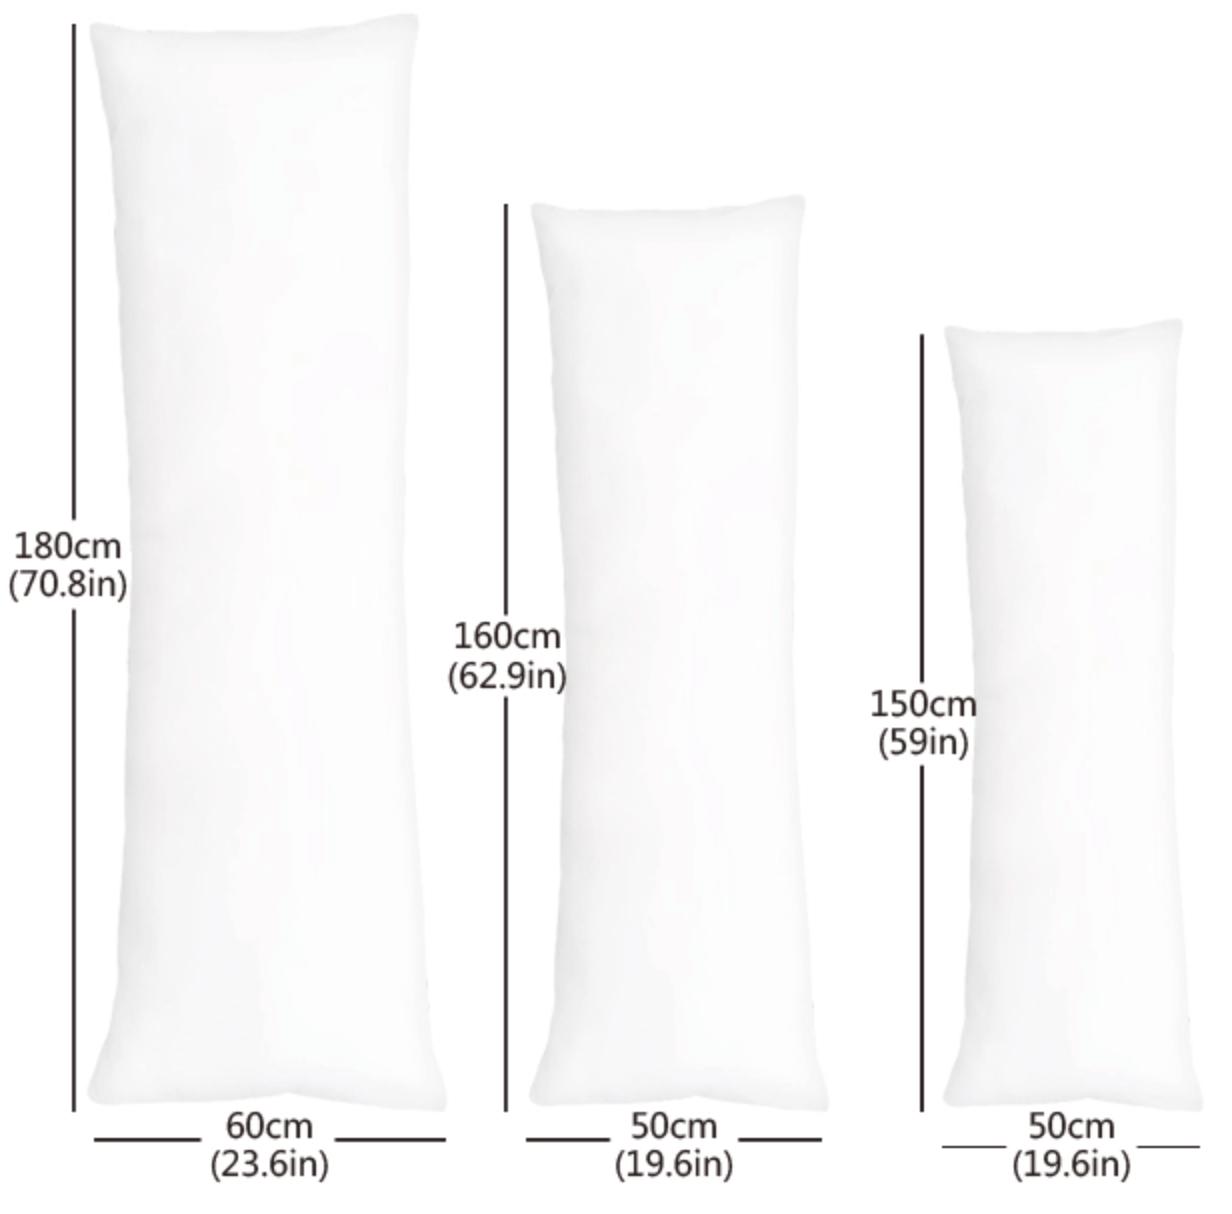 standard pillow and pillowcase size